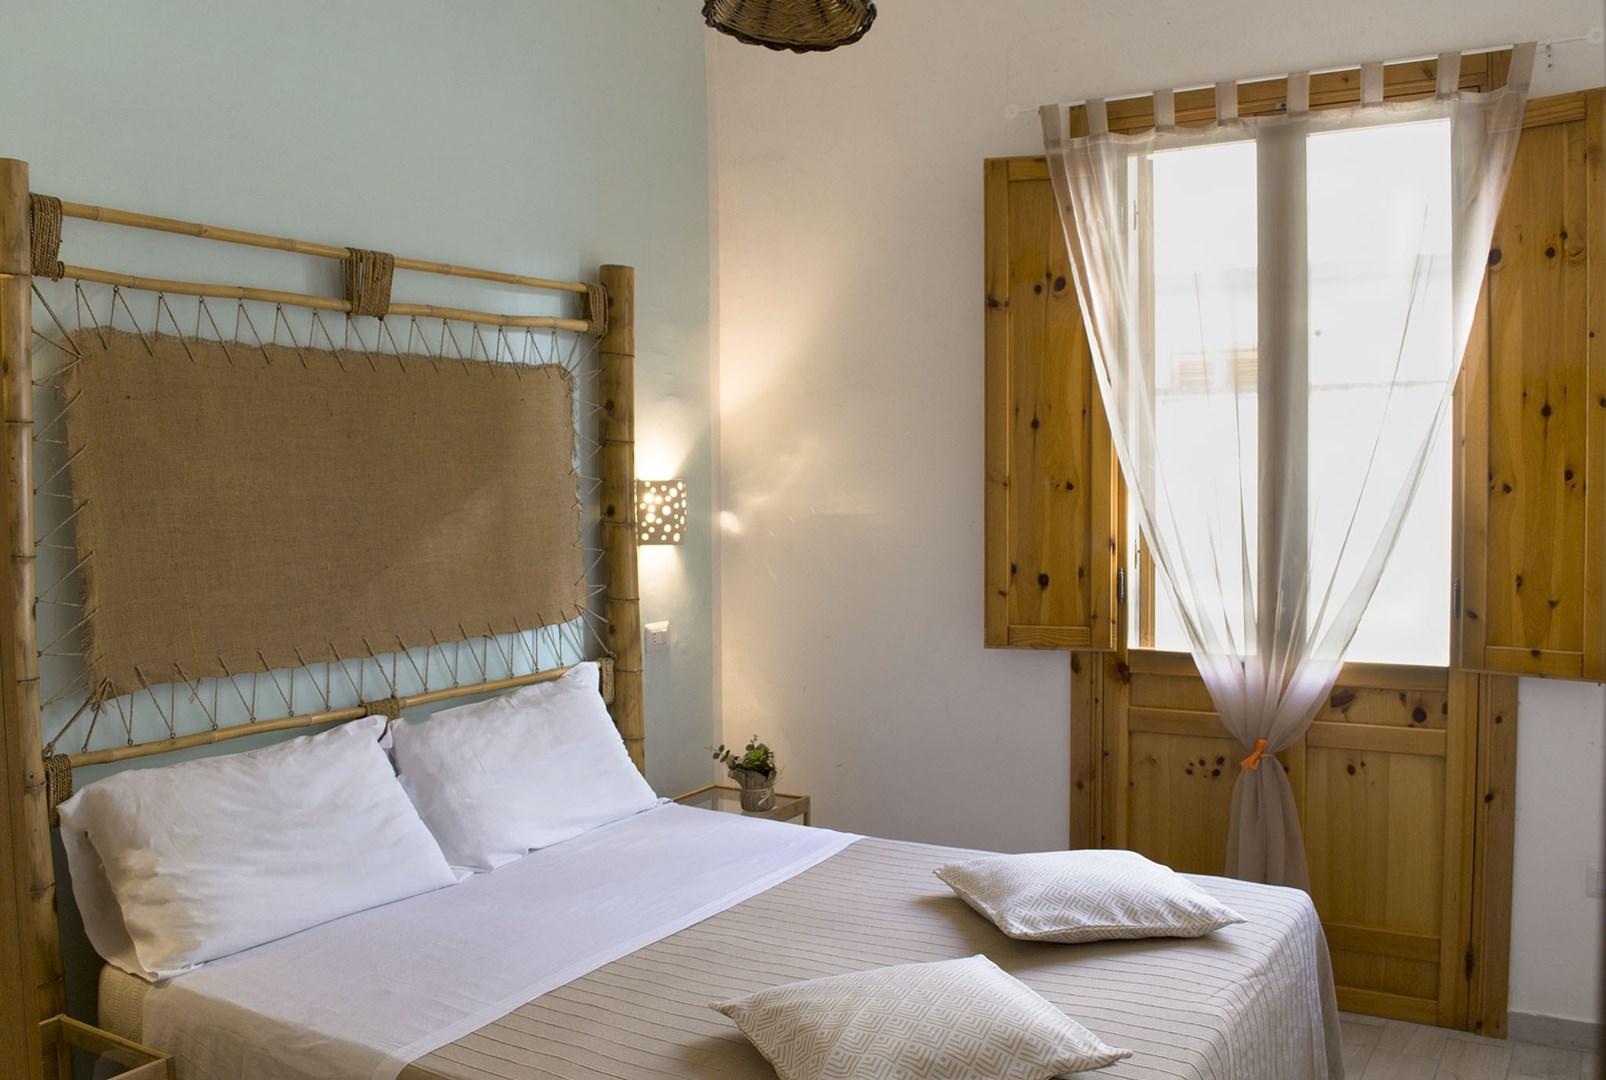 6_residence-borgo-latino_residence_borgo_latino_camera_matrimoniale_trilo.jpg